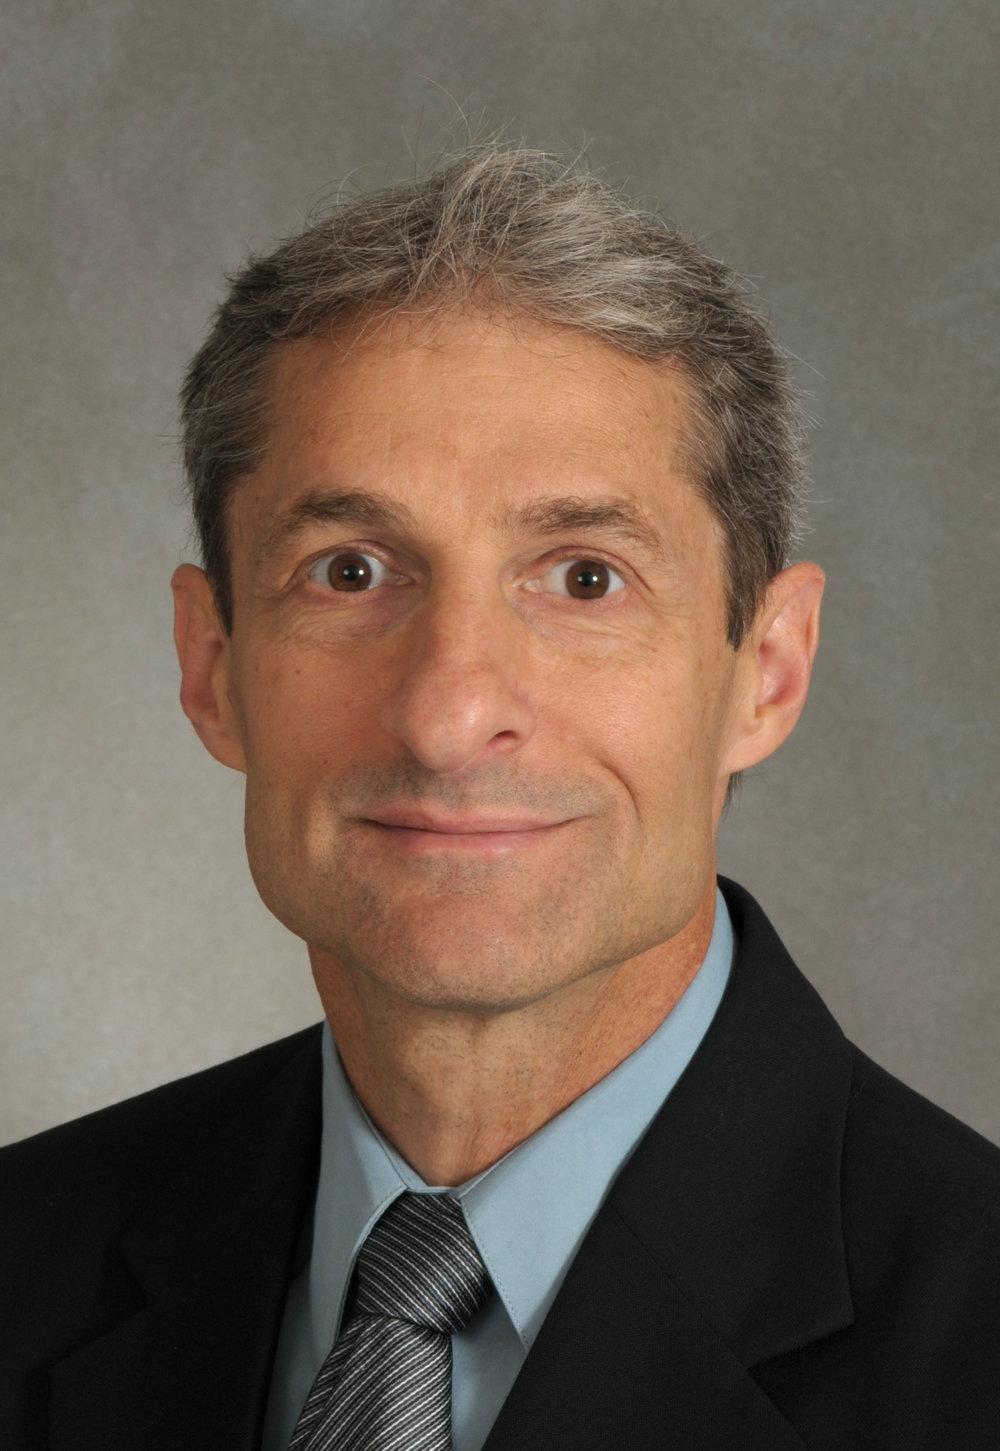 <strong>Dr. Richard J. Reeder</strong>